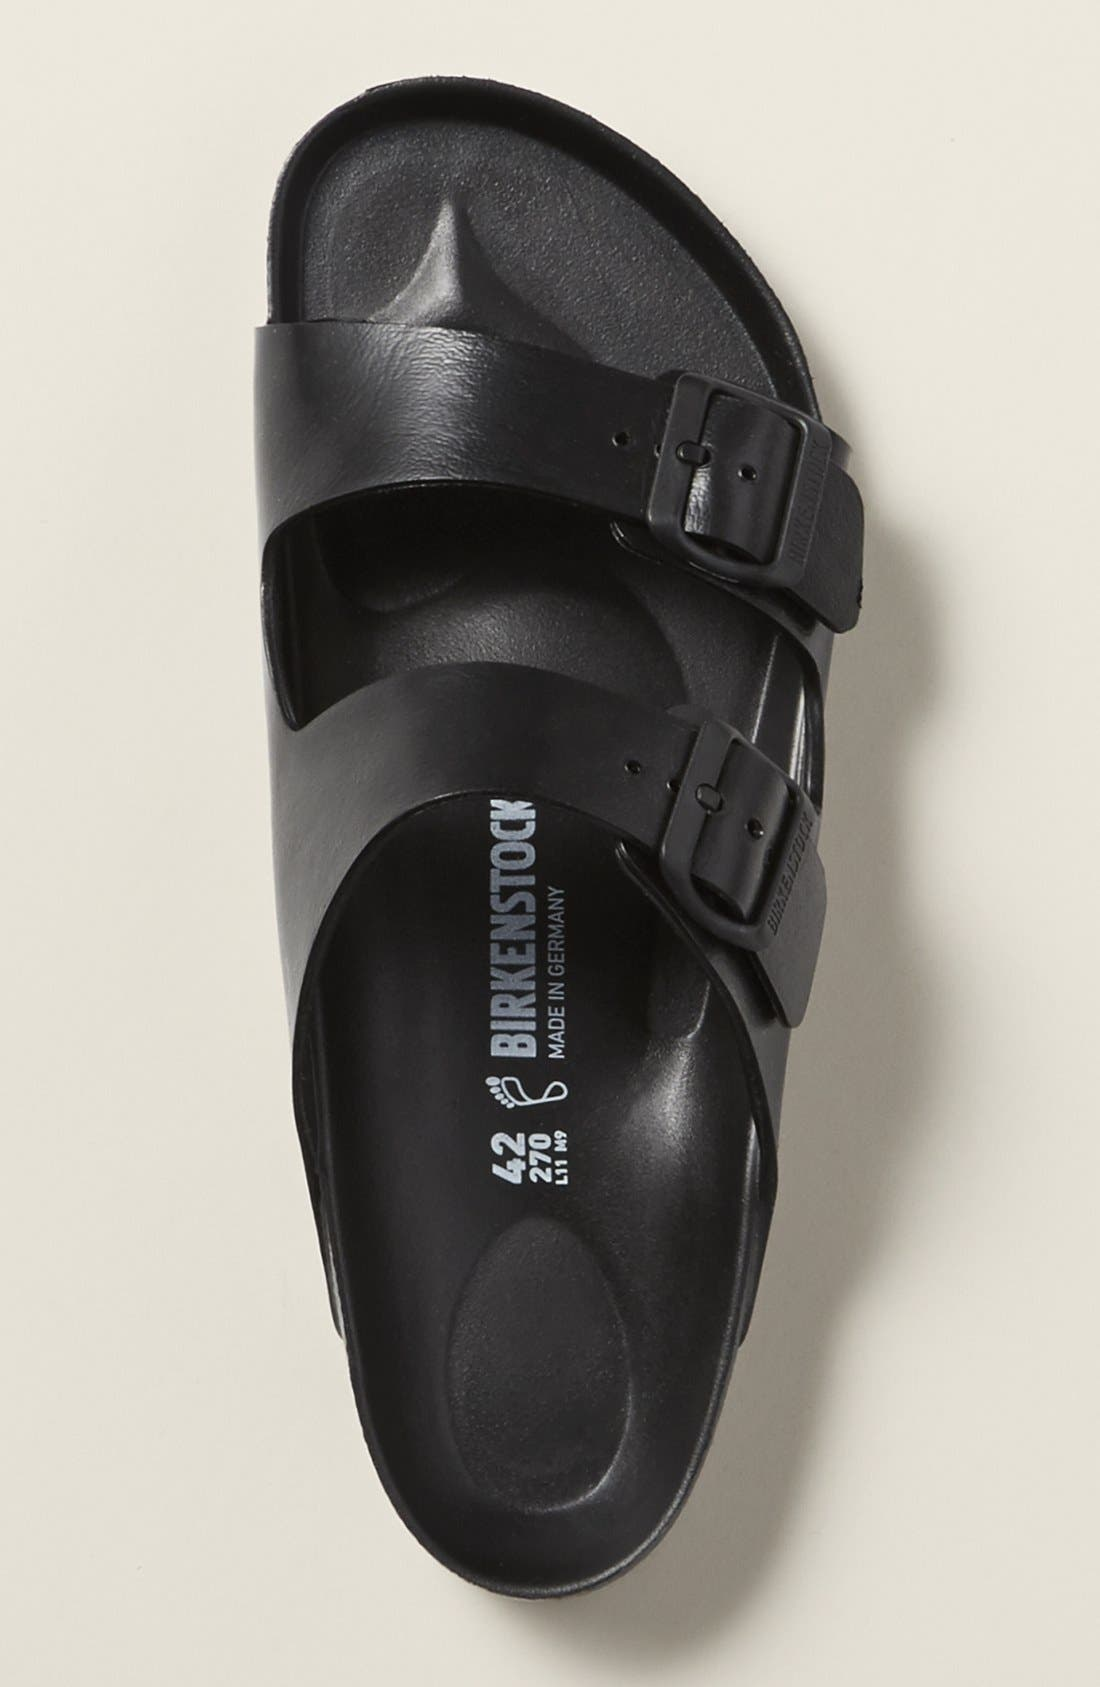 'Essentials - Arizona EVA' Waterproof Slide Sandal,                             Alternate thumbnail 11, color,                             WHITE